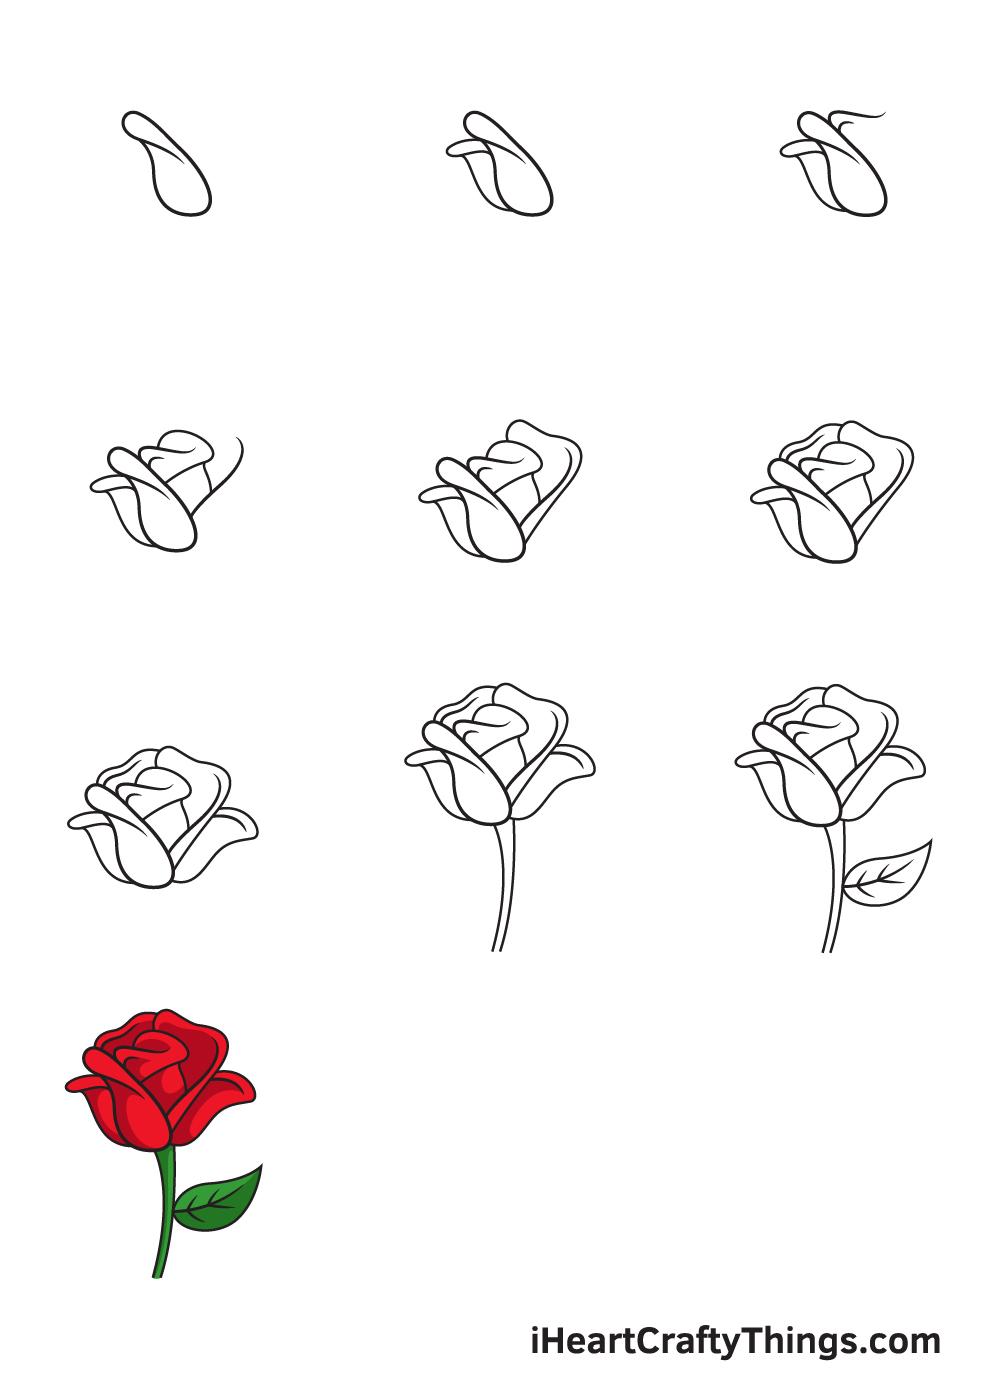 рисование розы за 9 шагов